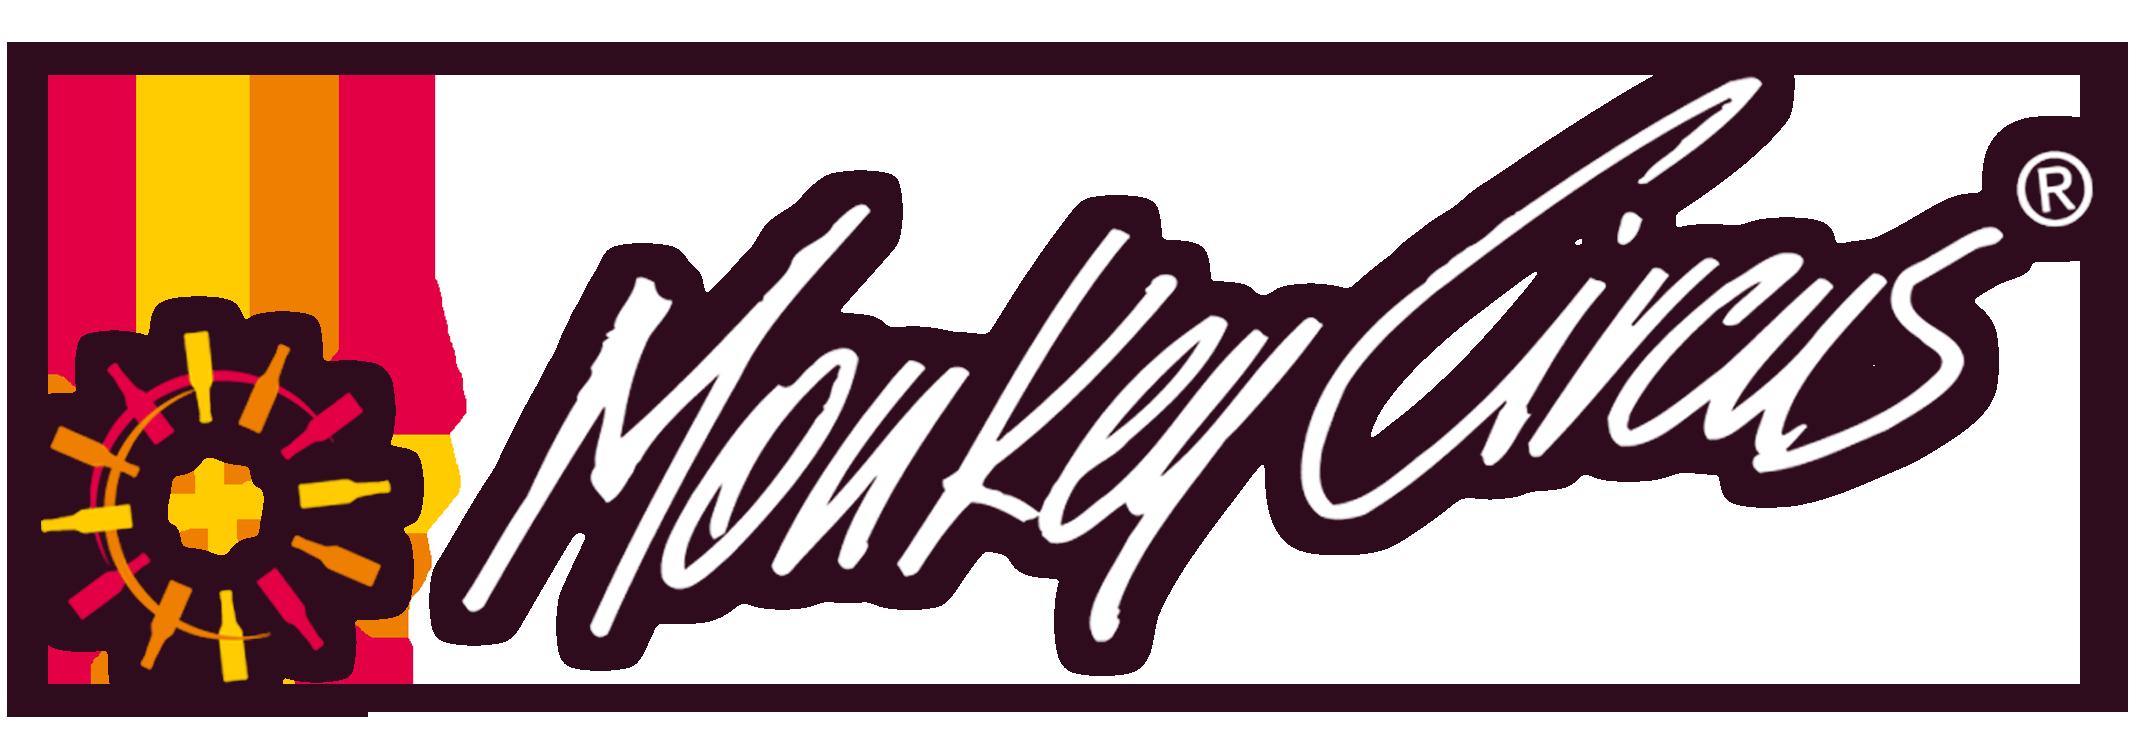 monkeycircus.at